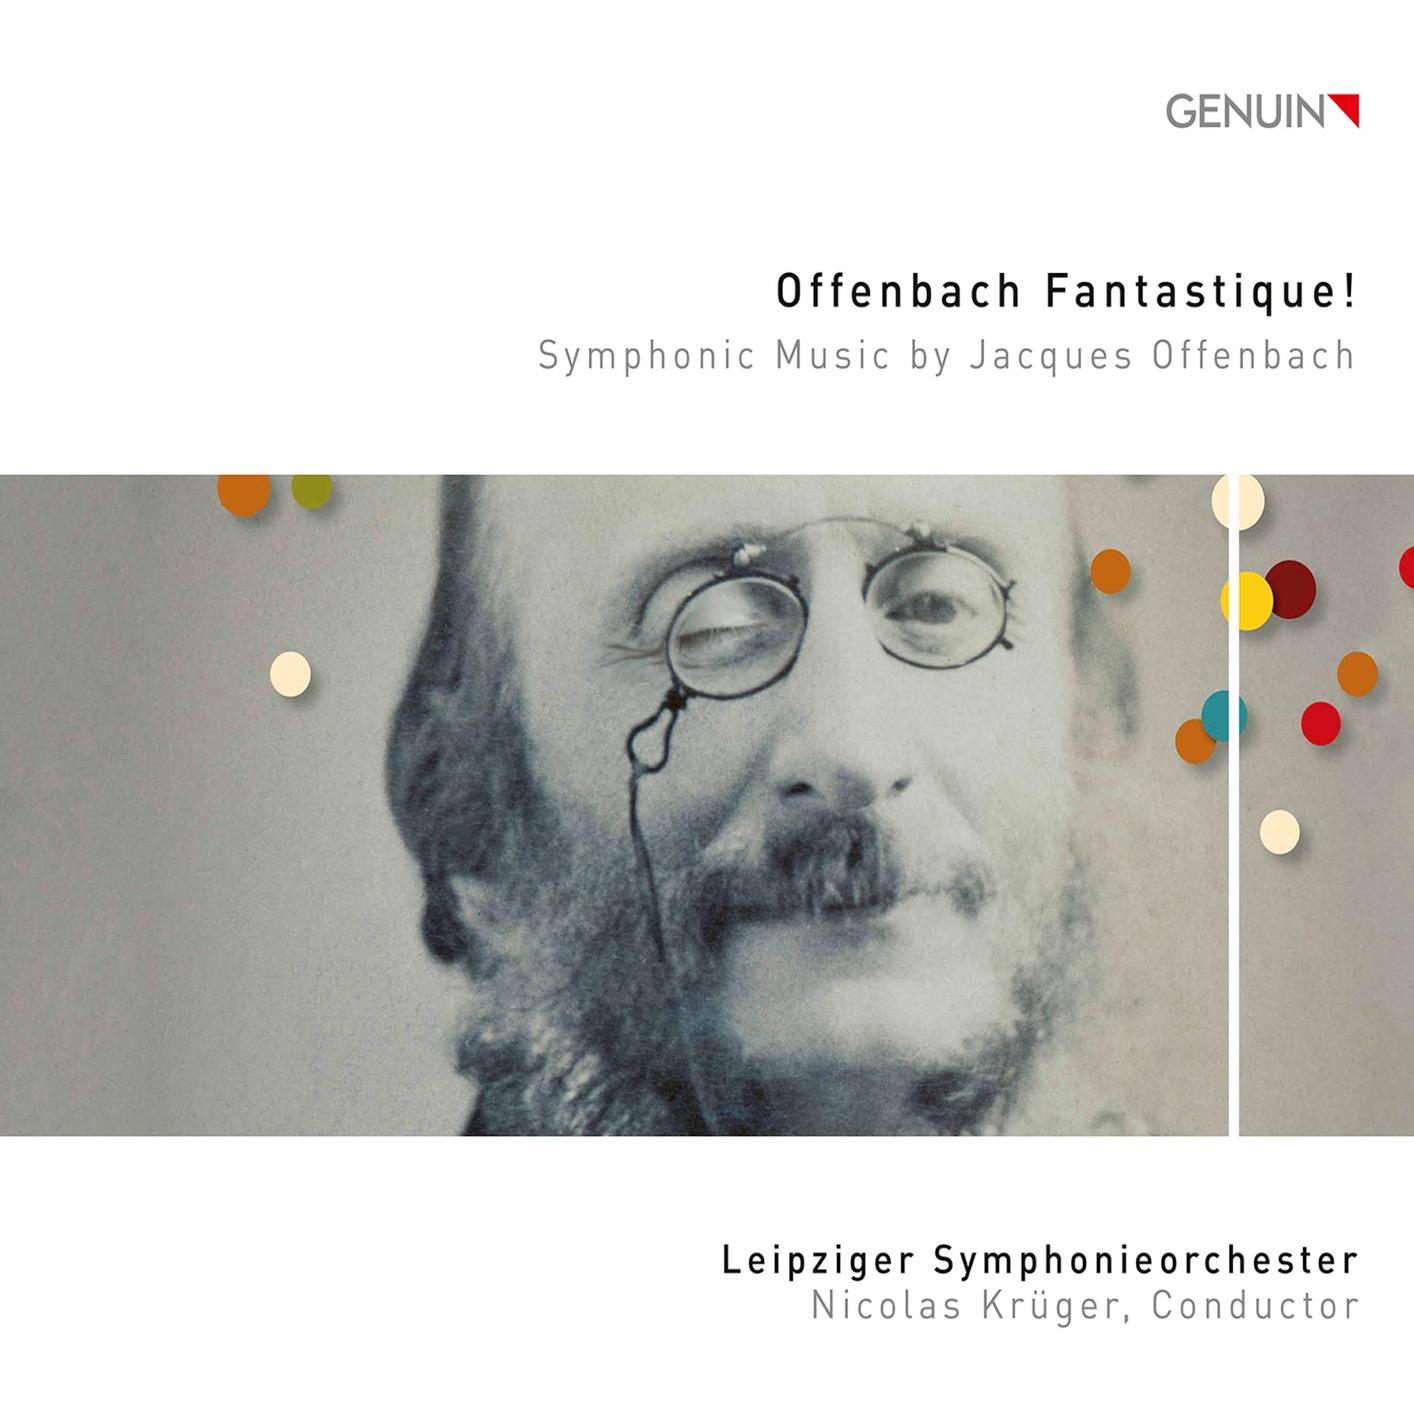 Offenbach Fantastique! | HIGHRESAUDIO